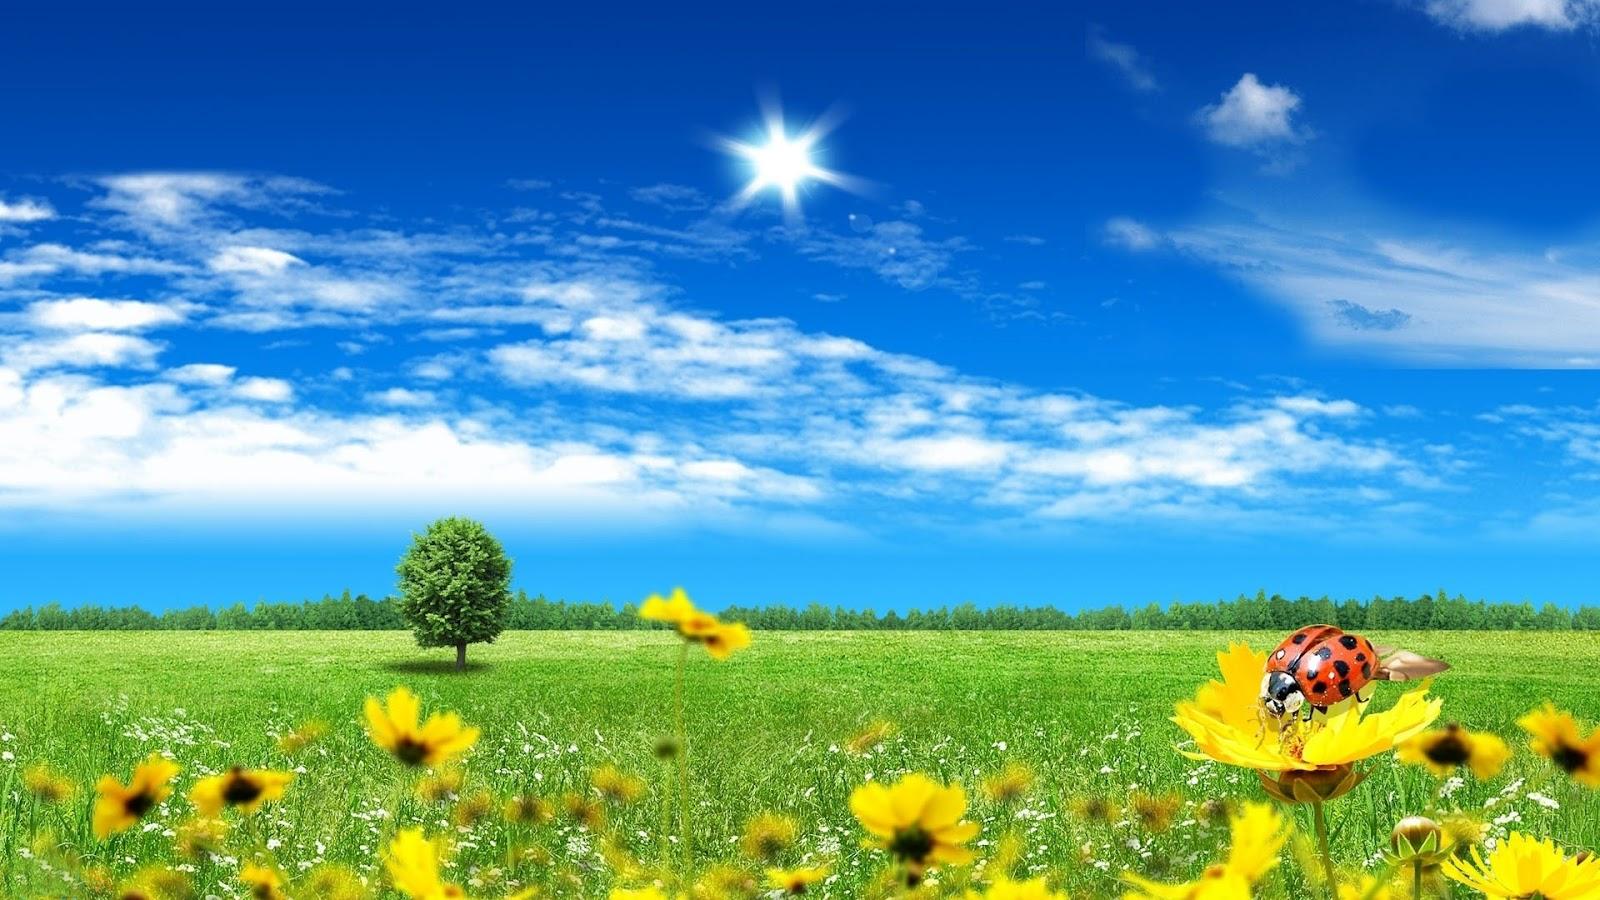 Backgrounds Spring Wallpapers Top Best HD Wallpapers for Desktop 1600x900